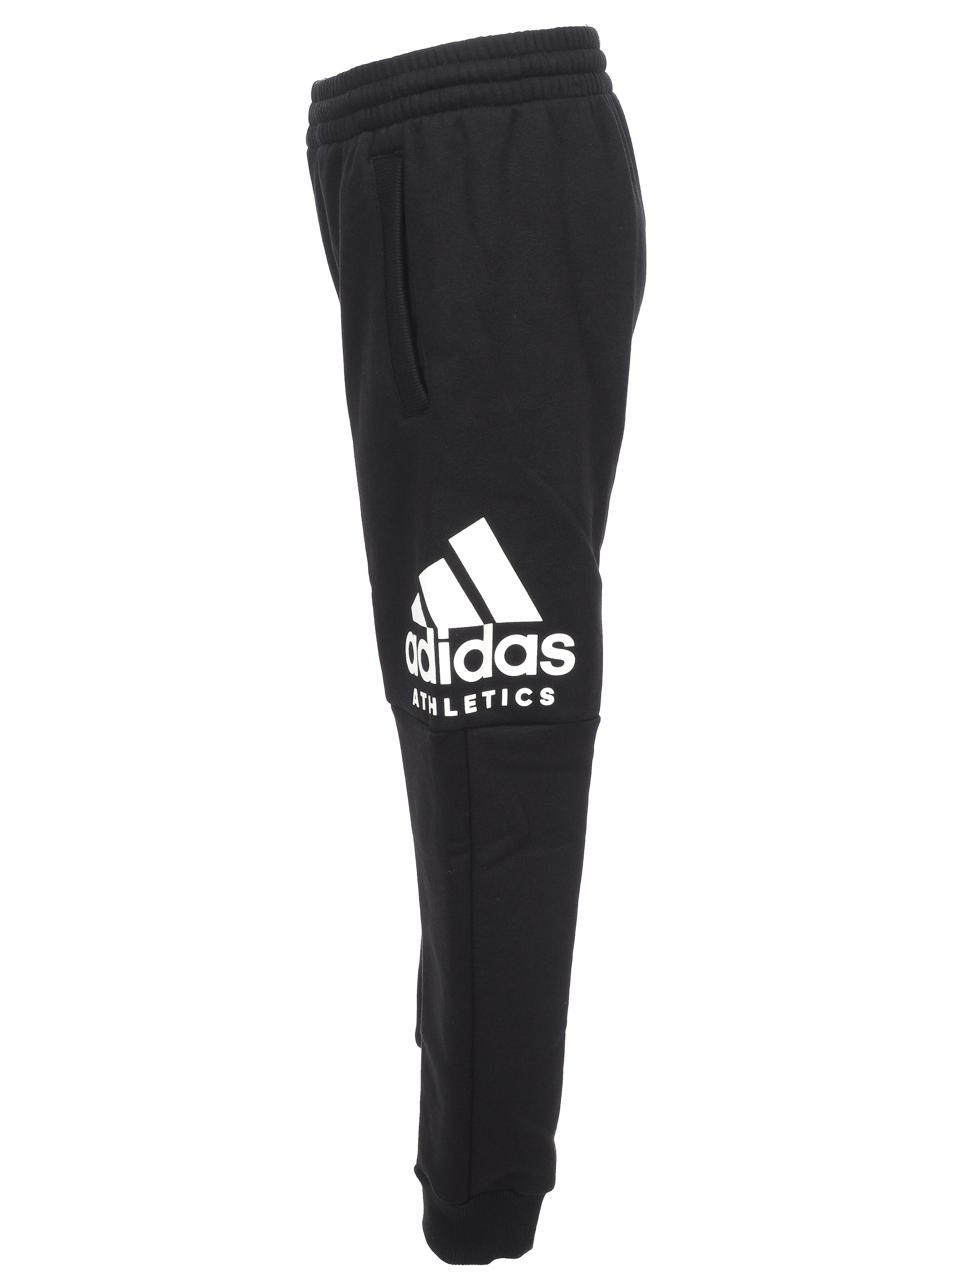 Pantalon-de-survetement-Adidas-Yb-sid-pant-black-whit-jr-Noir-58226-Neuf